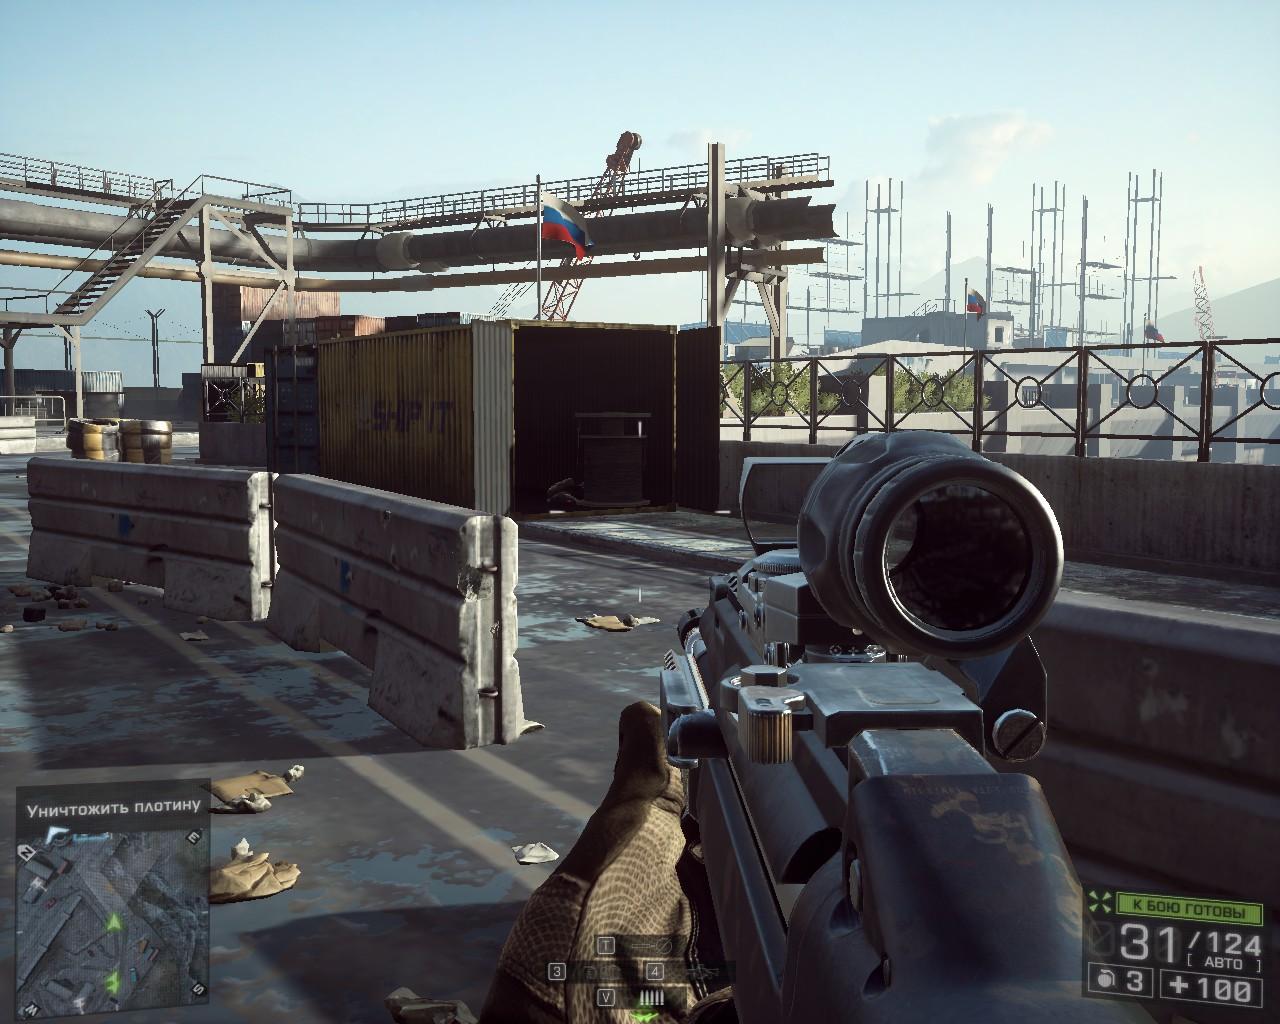 bf4 2014-04-07 00-09-41-41.jpg - Battlefield 4